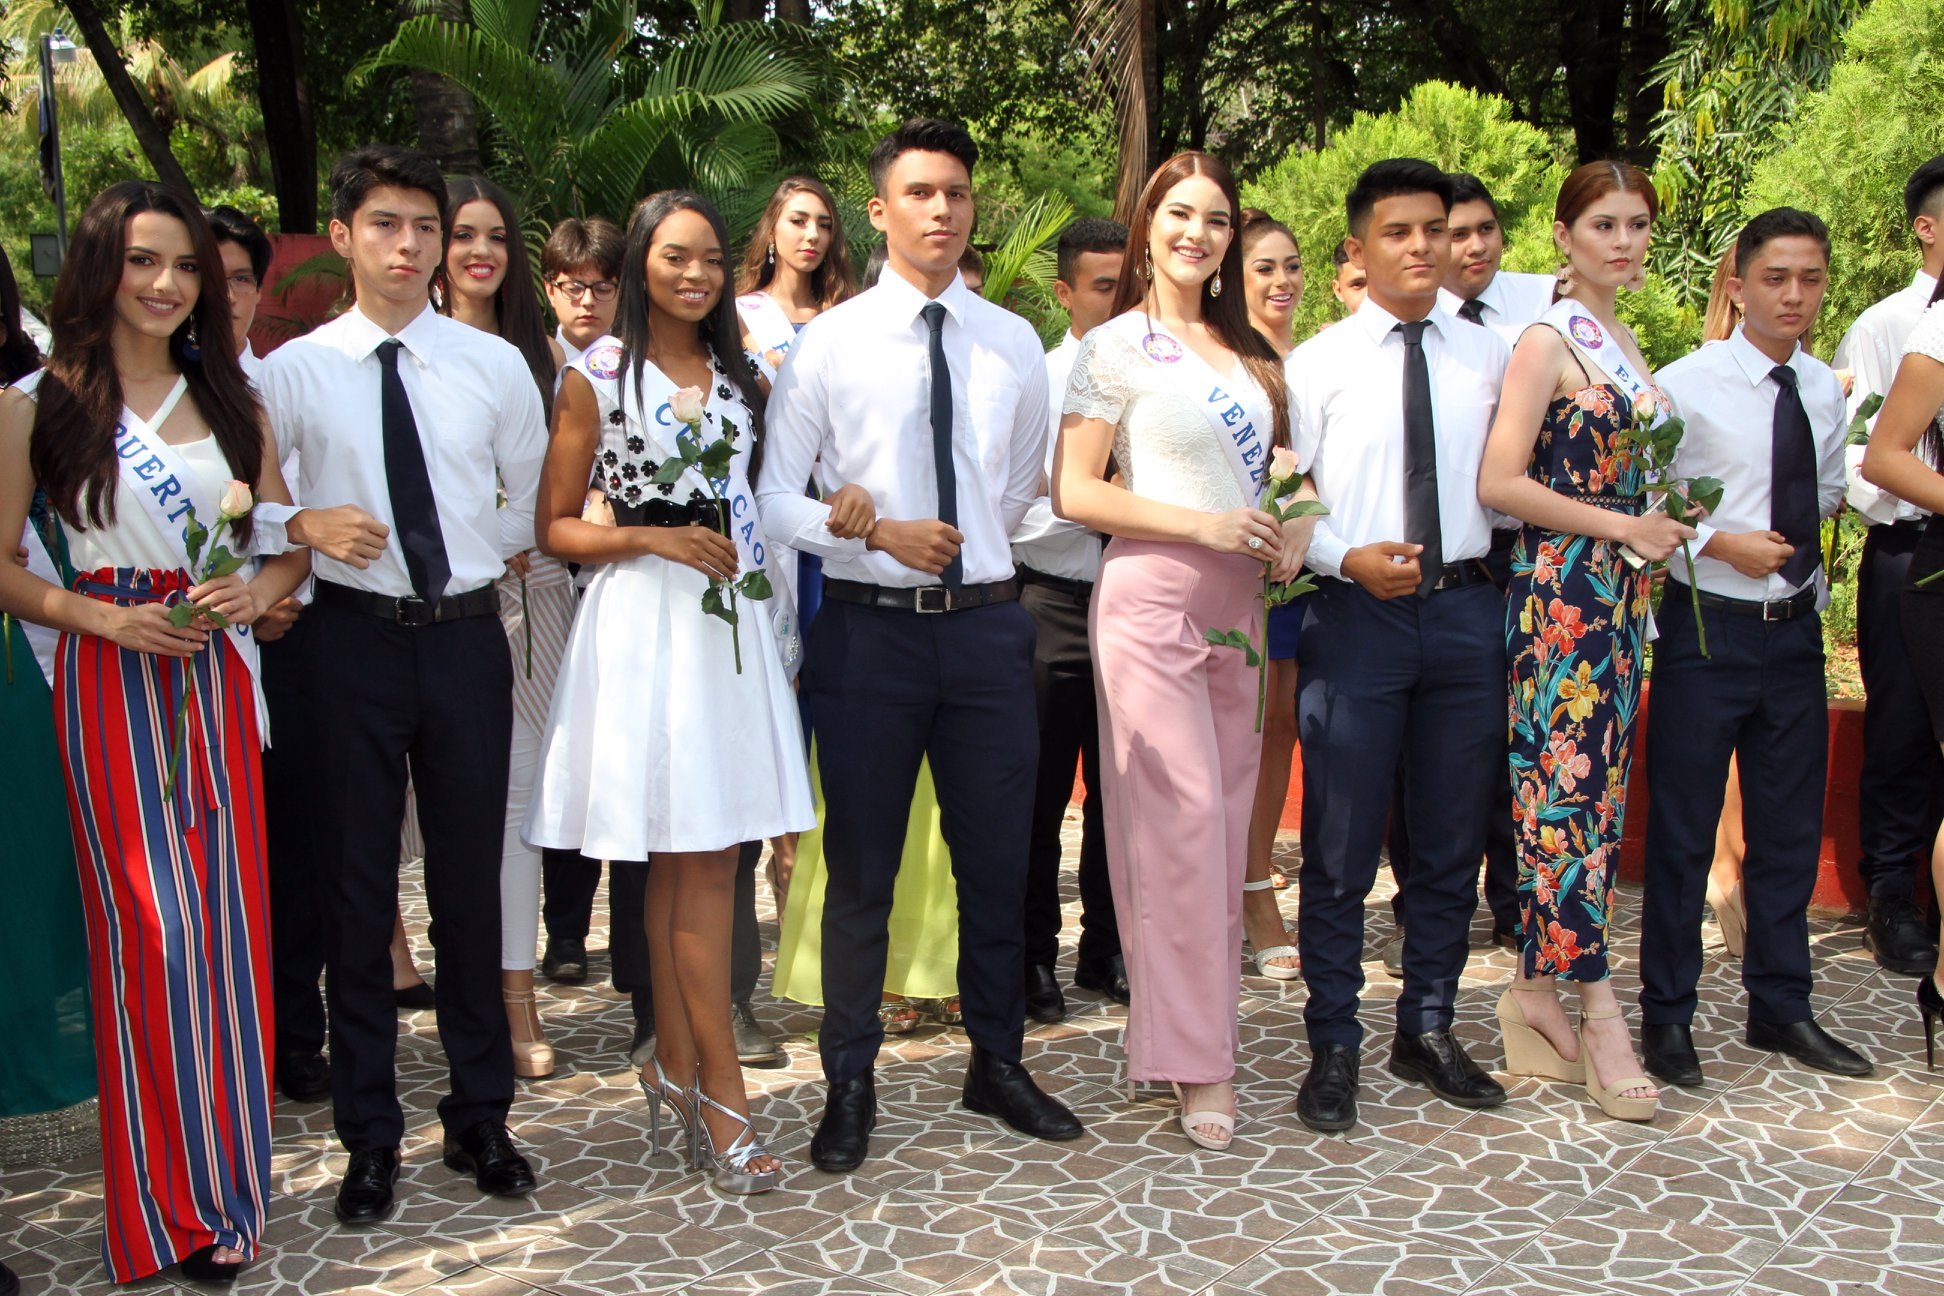 daniela di venere, top 12 de miss teen mundial 2019. - Página 5 61110410